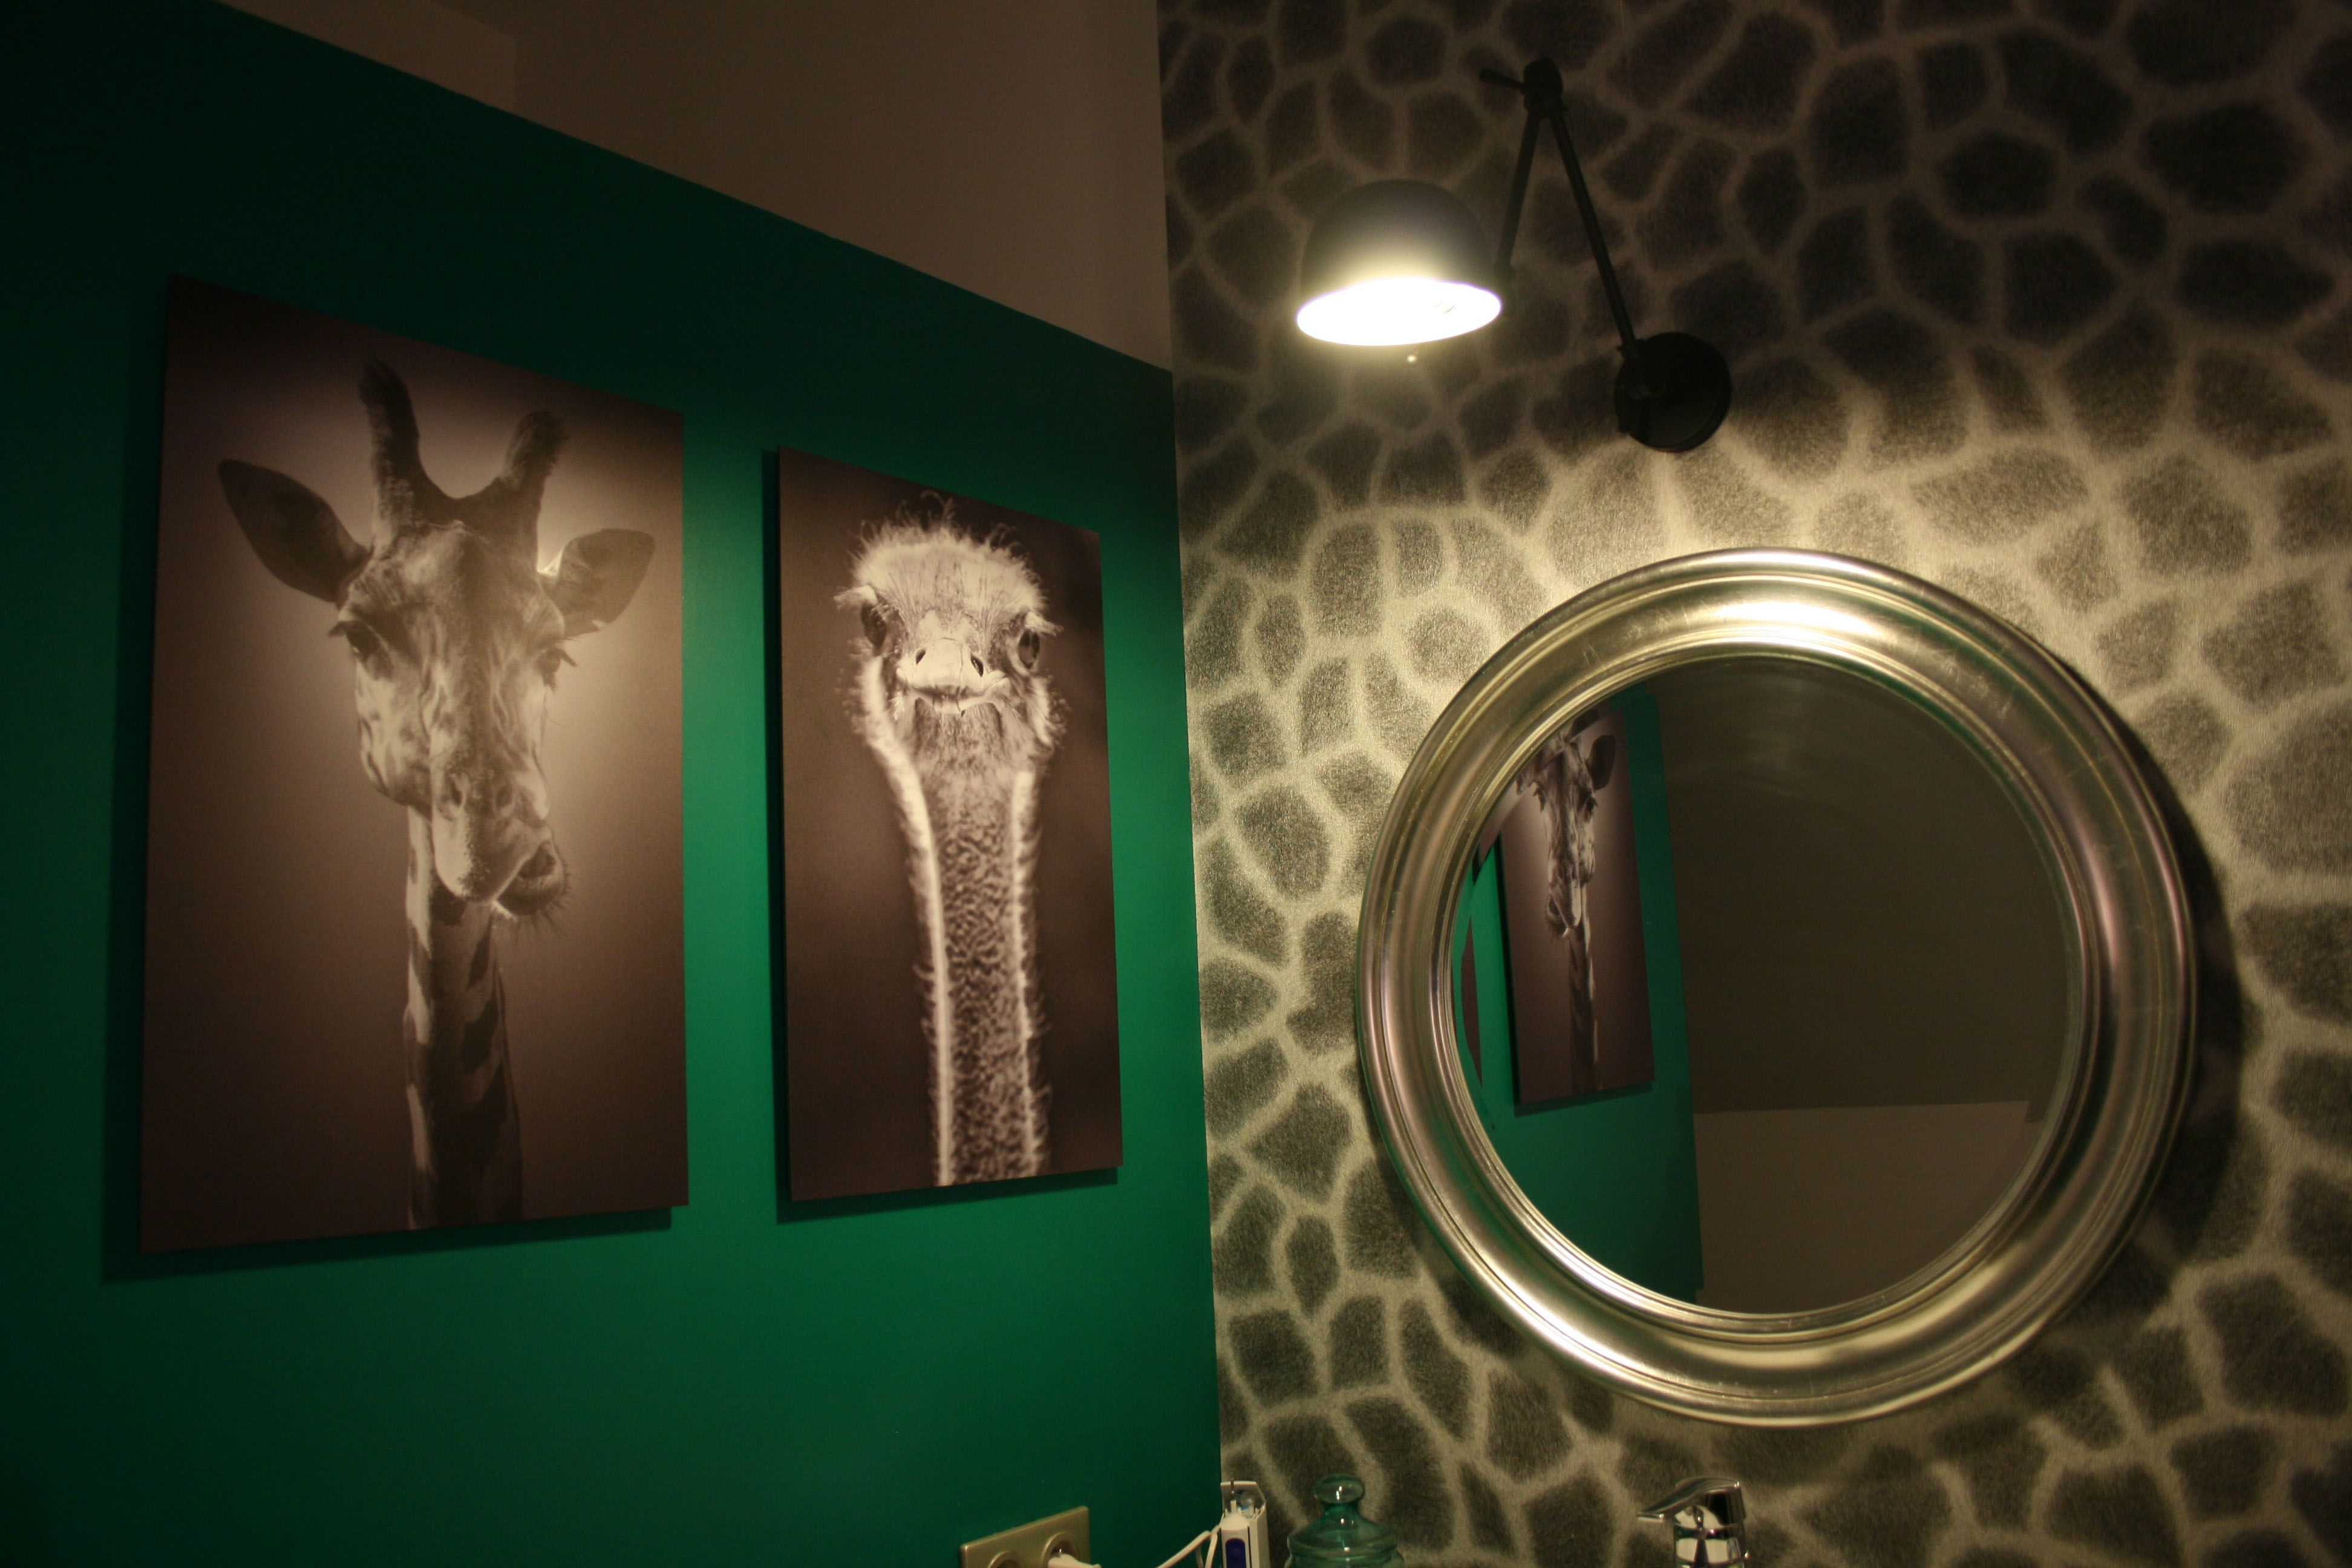 Rénovation peint de de papier salle bain peau girafe F1JcKl